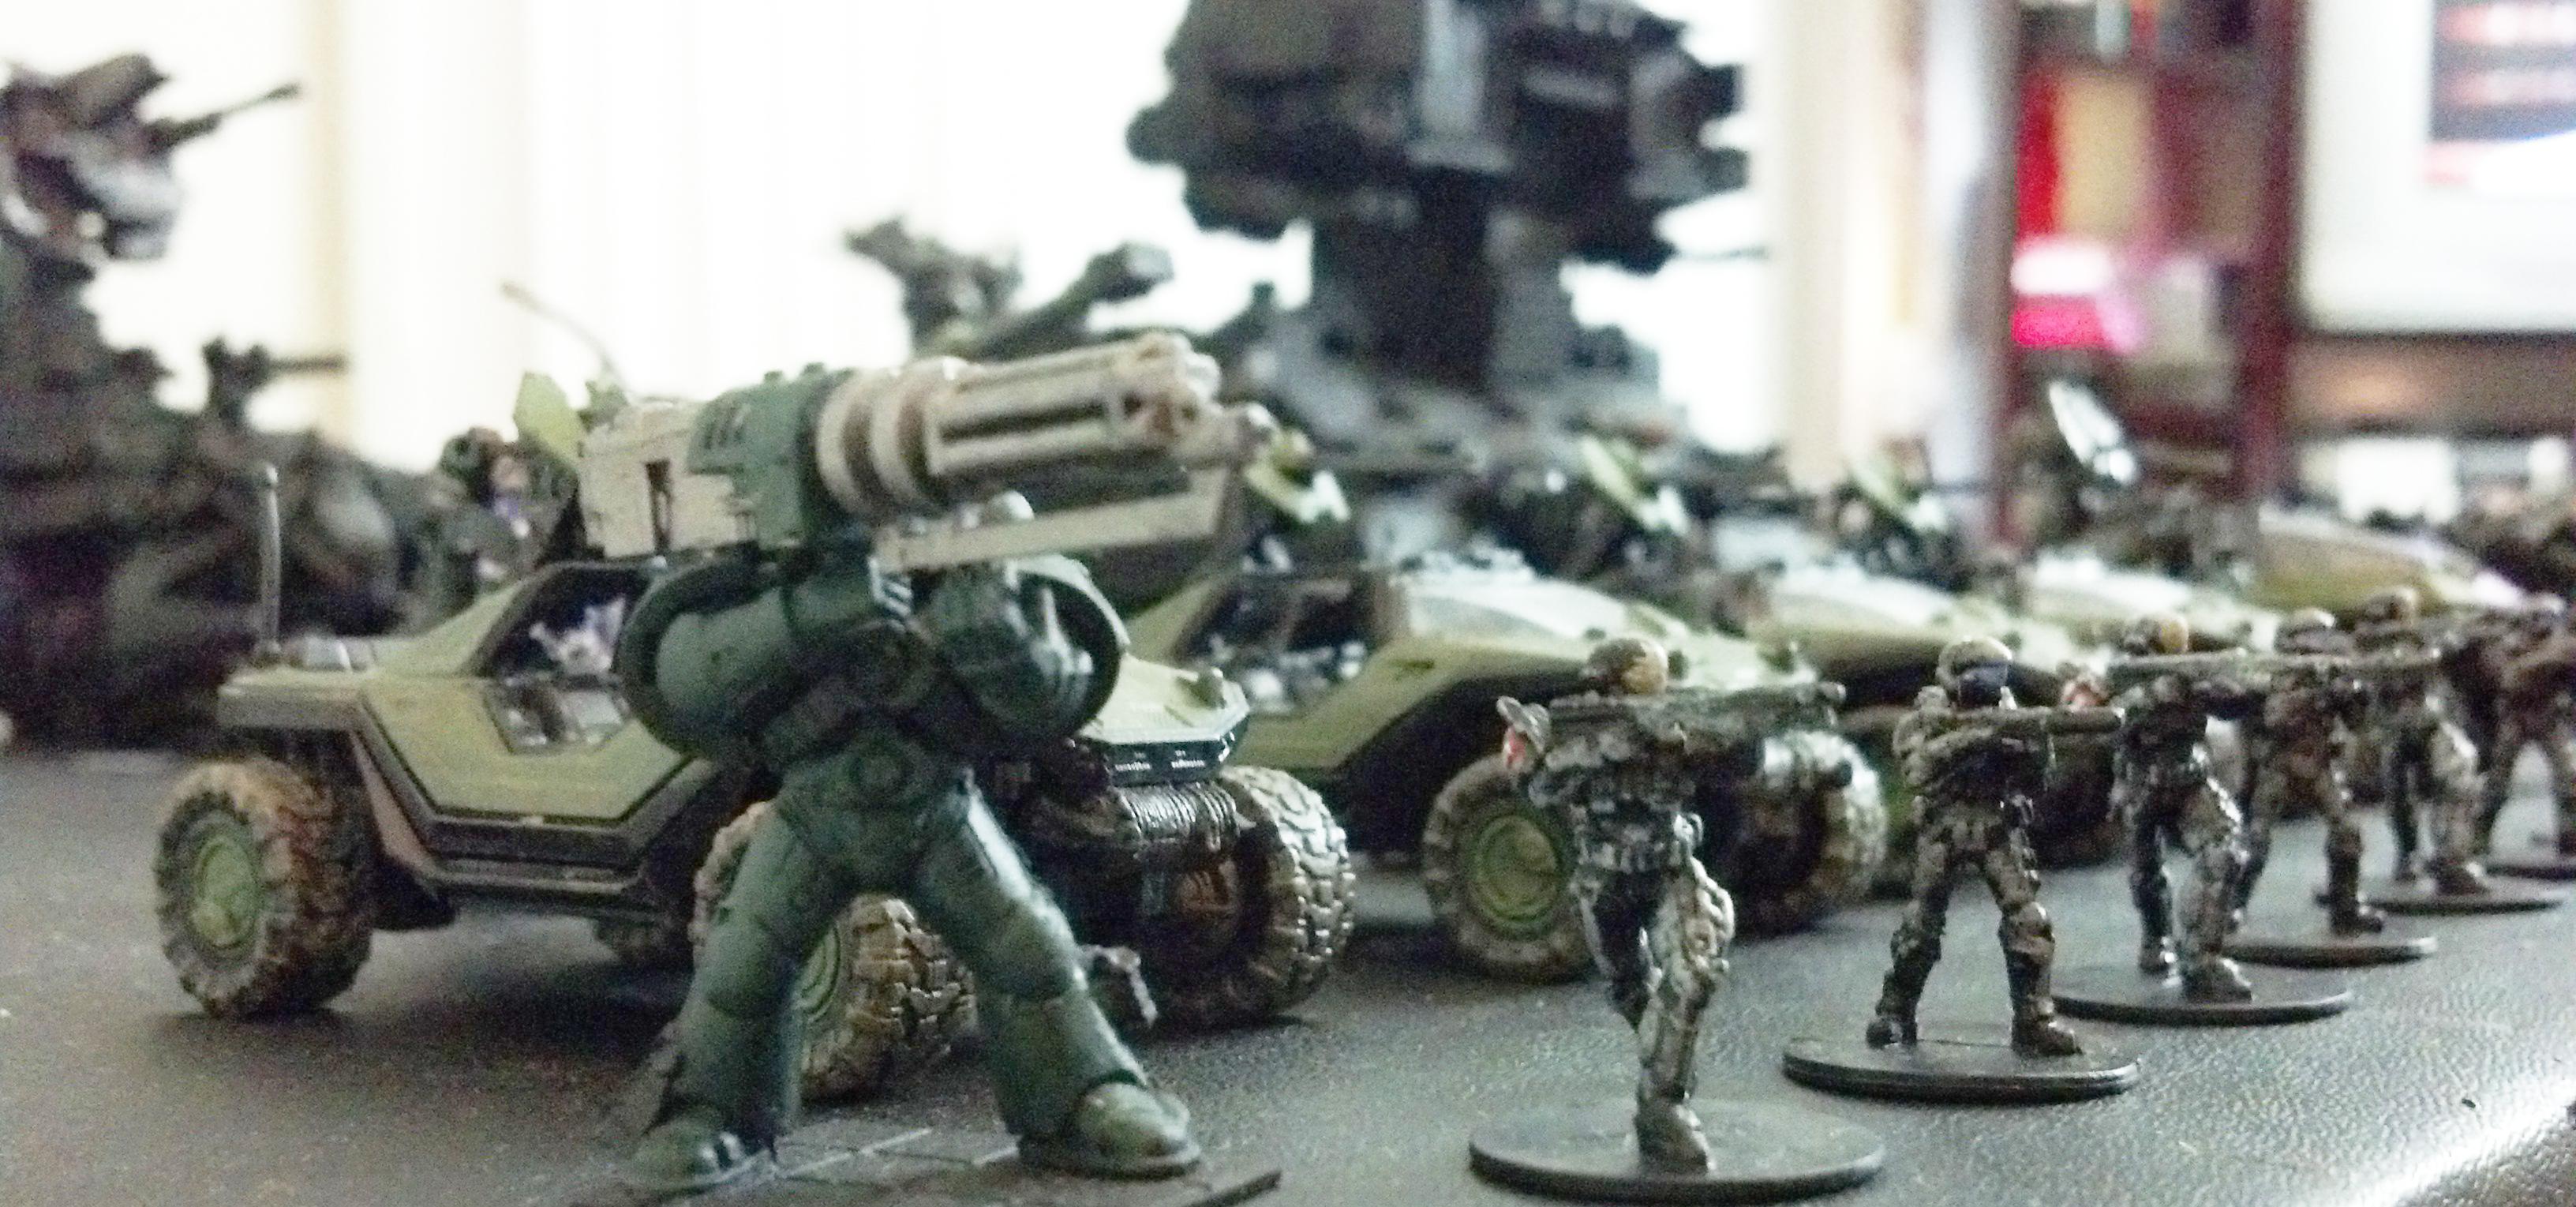 Army. Formation, Halo, Human, Imperium, Military, Space Marines, Warhammer 40,000, Warhammer Fantasy